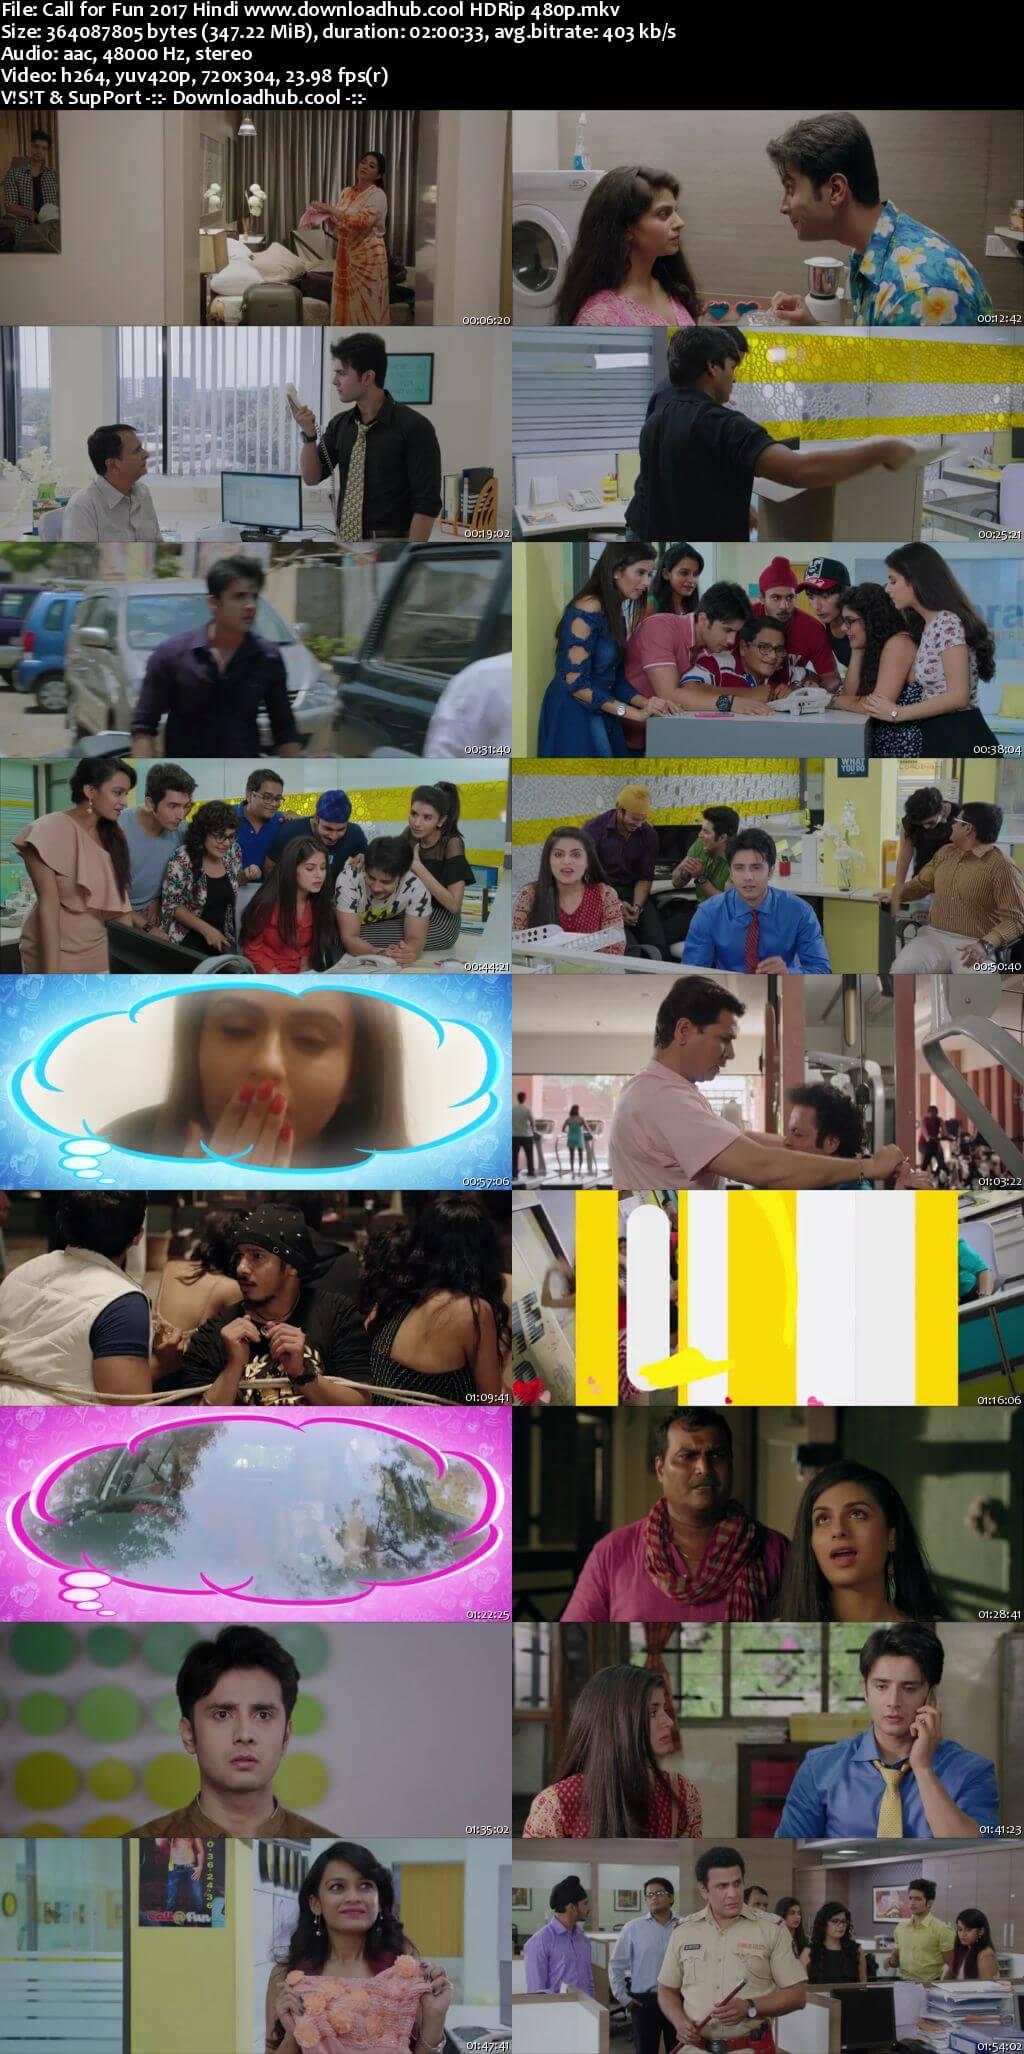 Call for Fun 2017 Hindi 350MB HDRip 480p